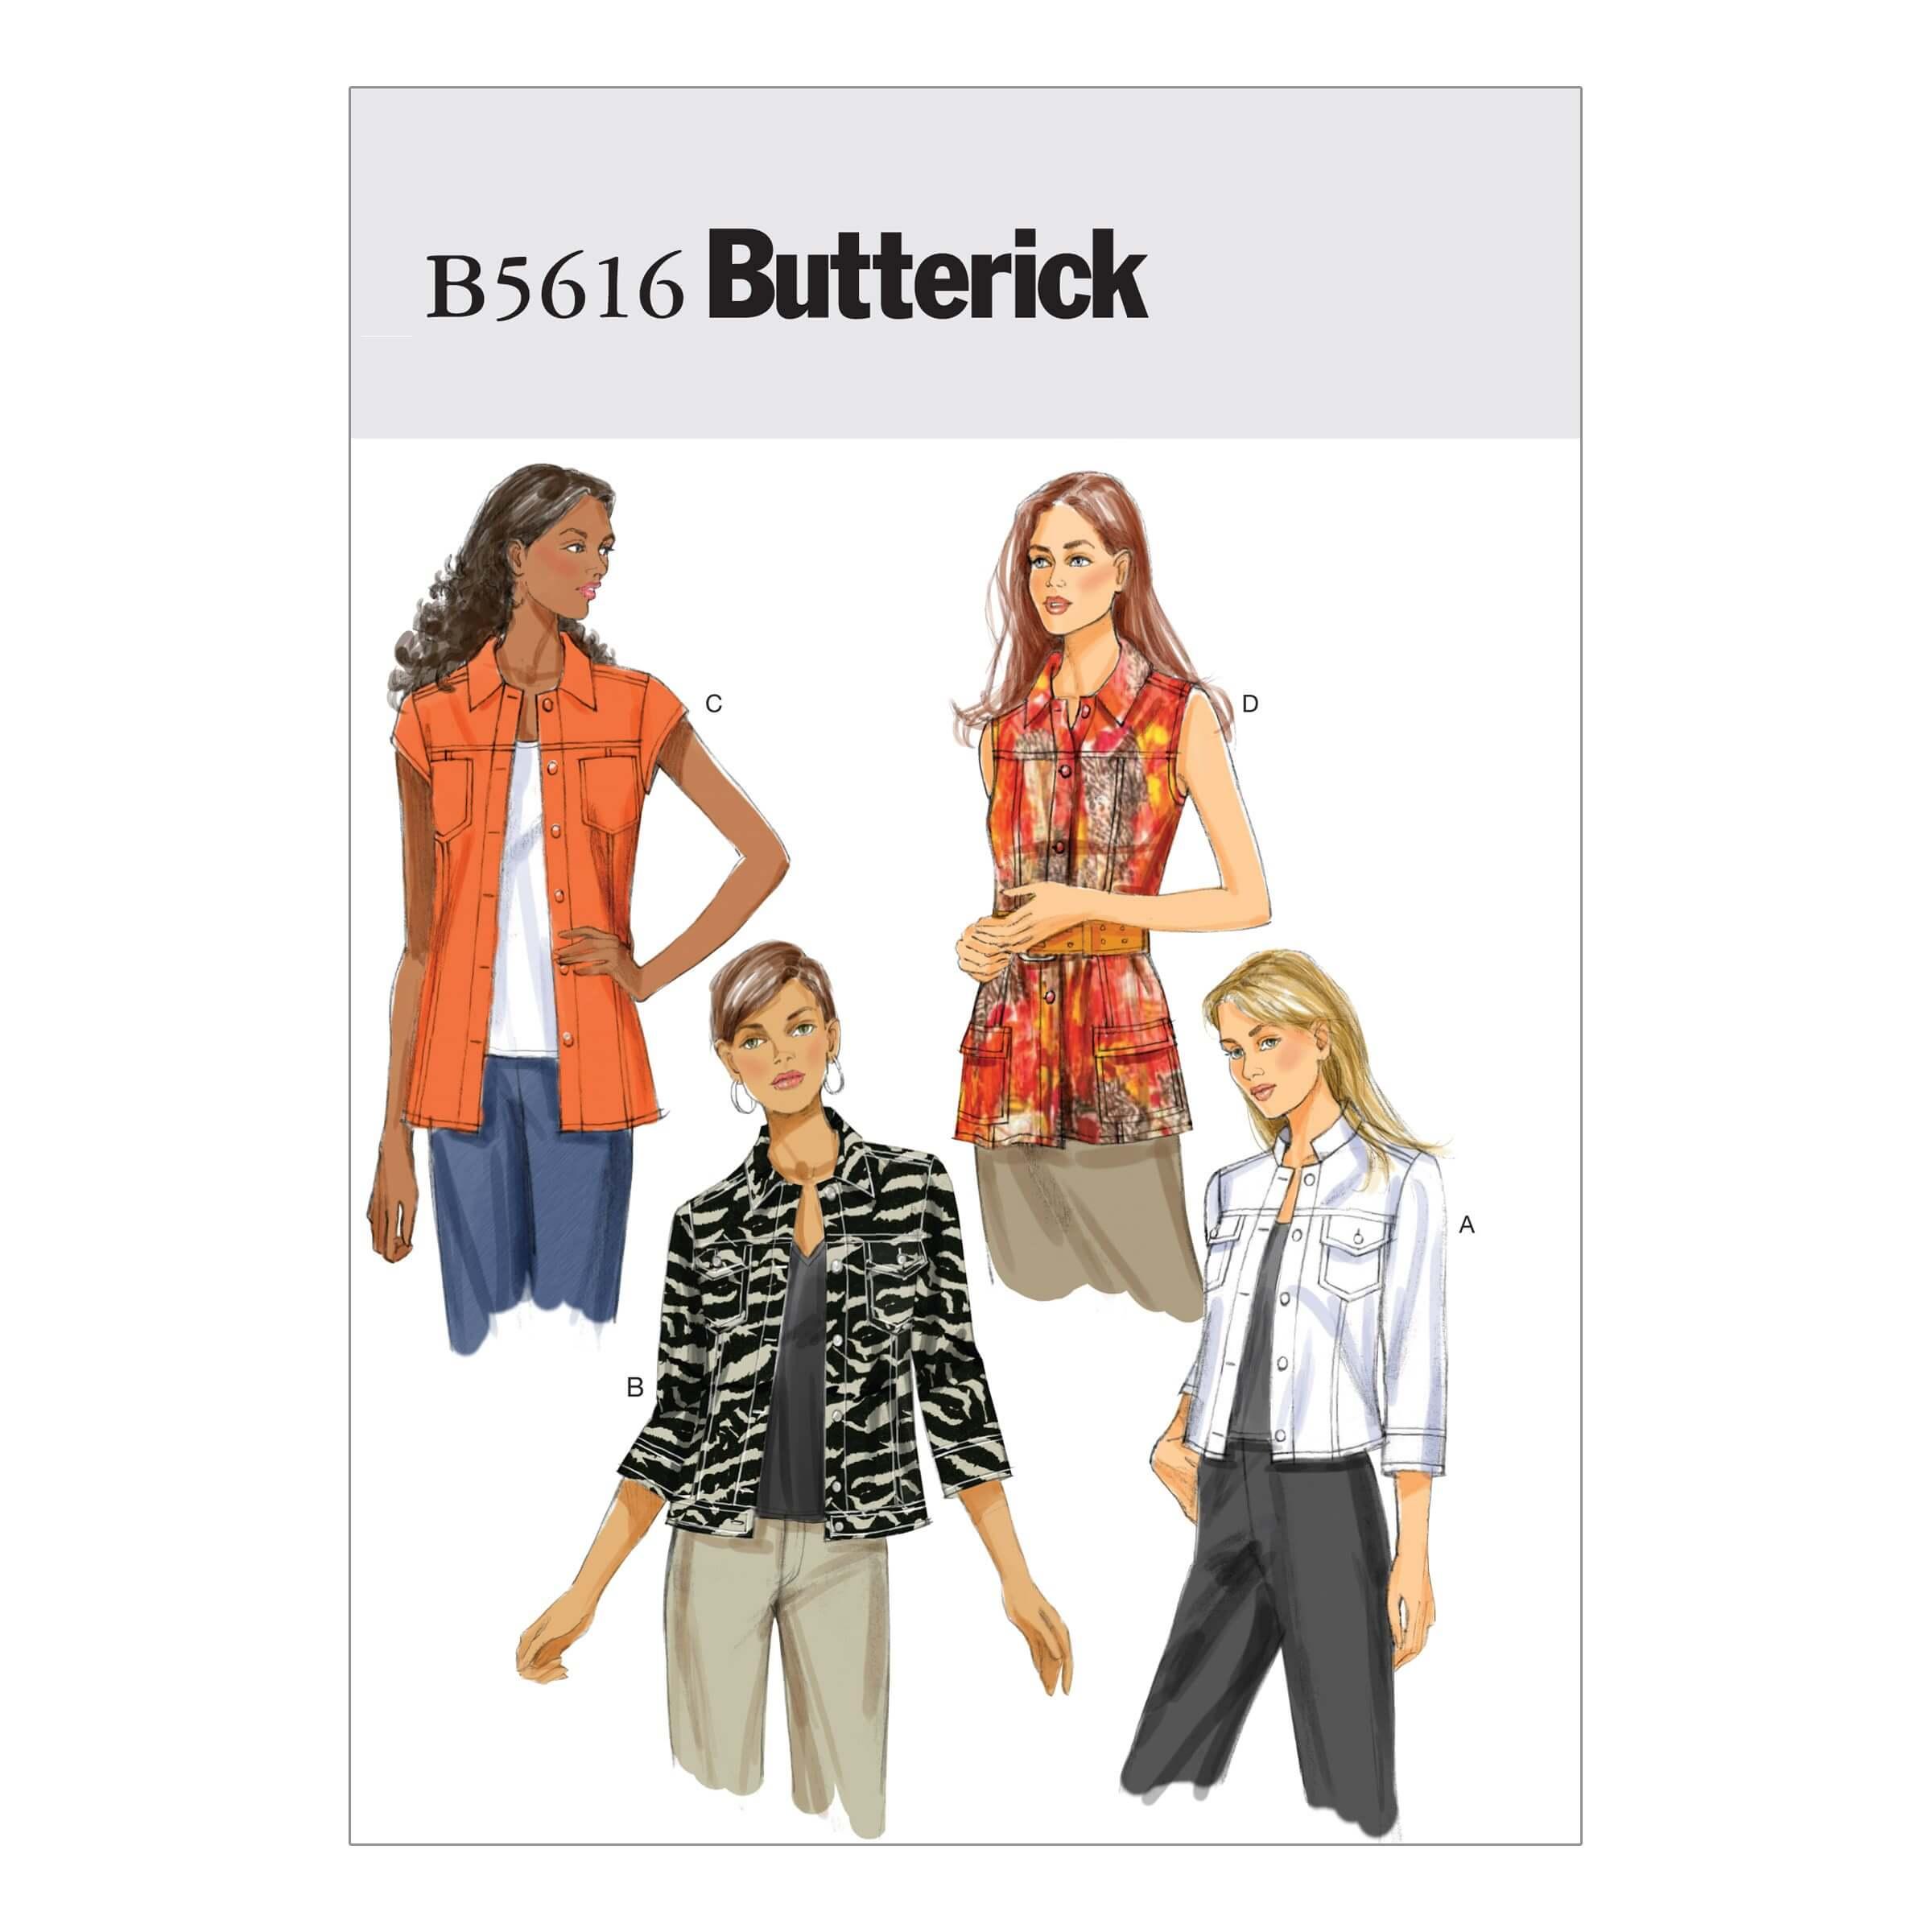 Butterick Sewing Pattern 5616 Misses' Fashion Jacket Coat Long & Short Sleeve